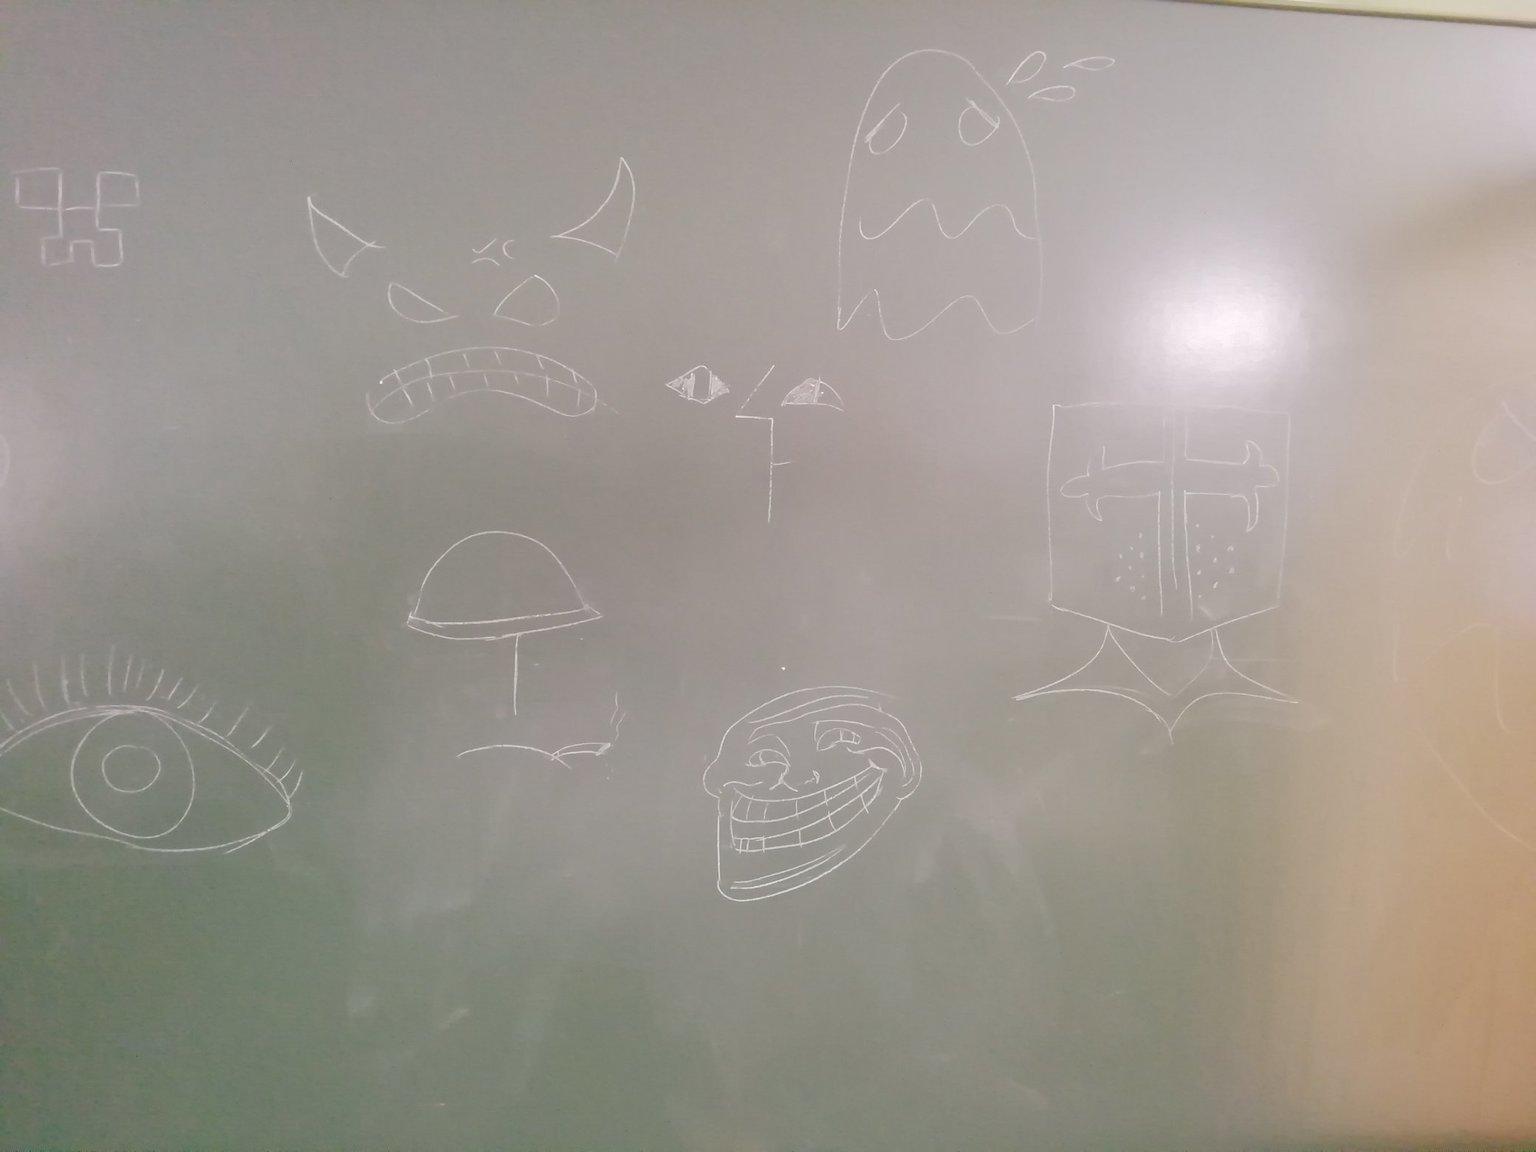 Dibujo en la pizarra que hize en clase - meme